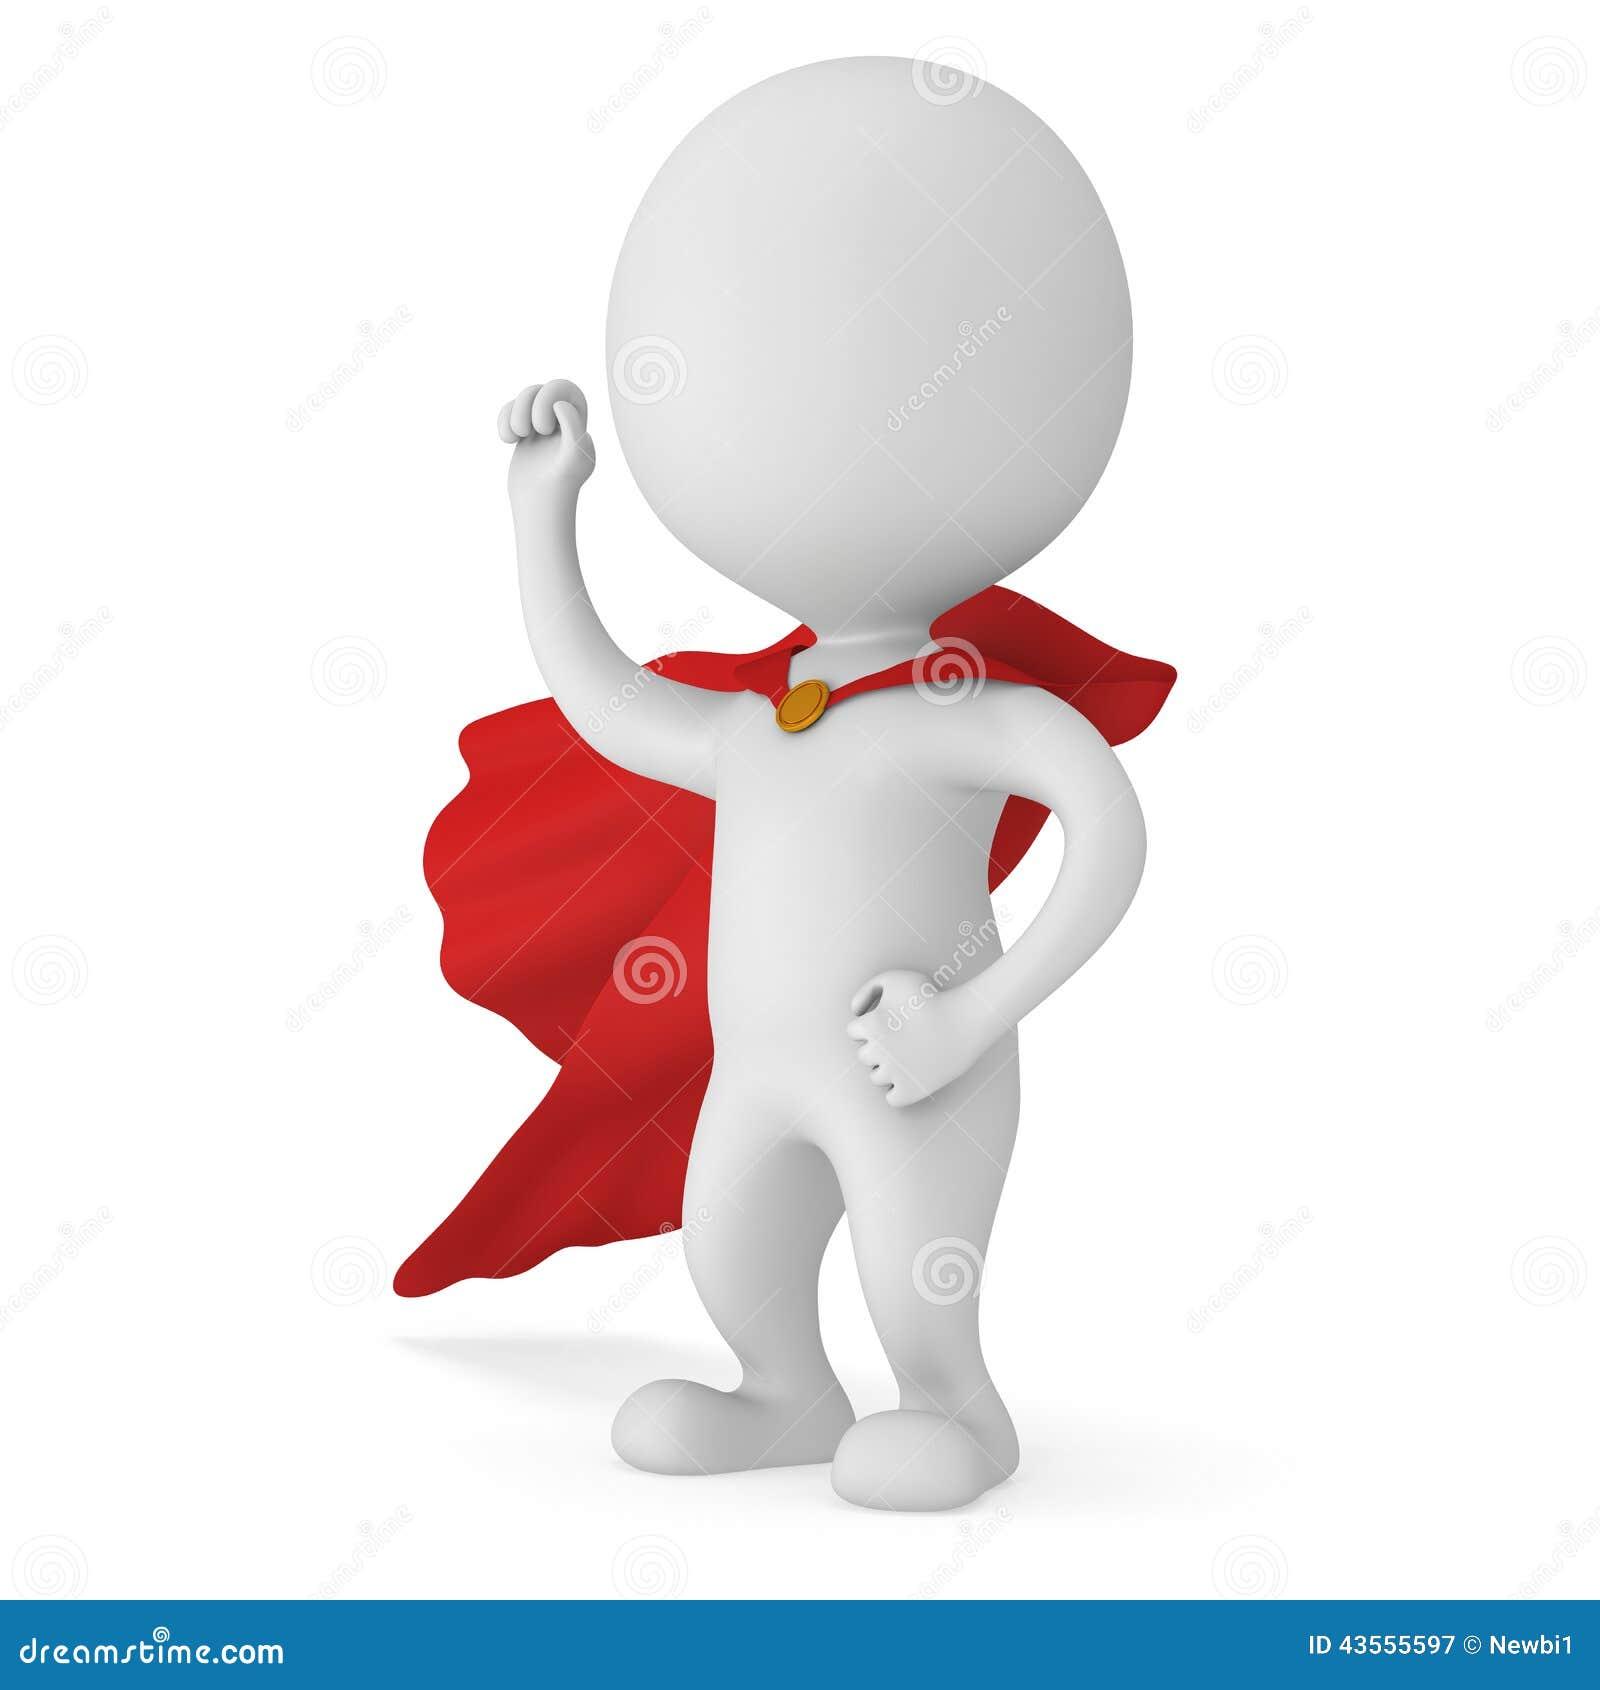 Rim job super hero